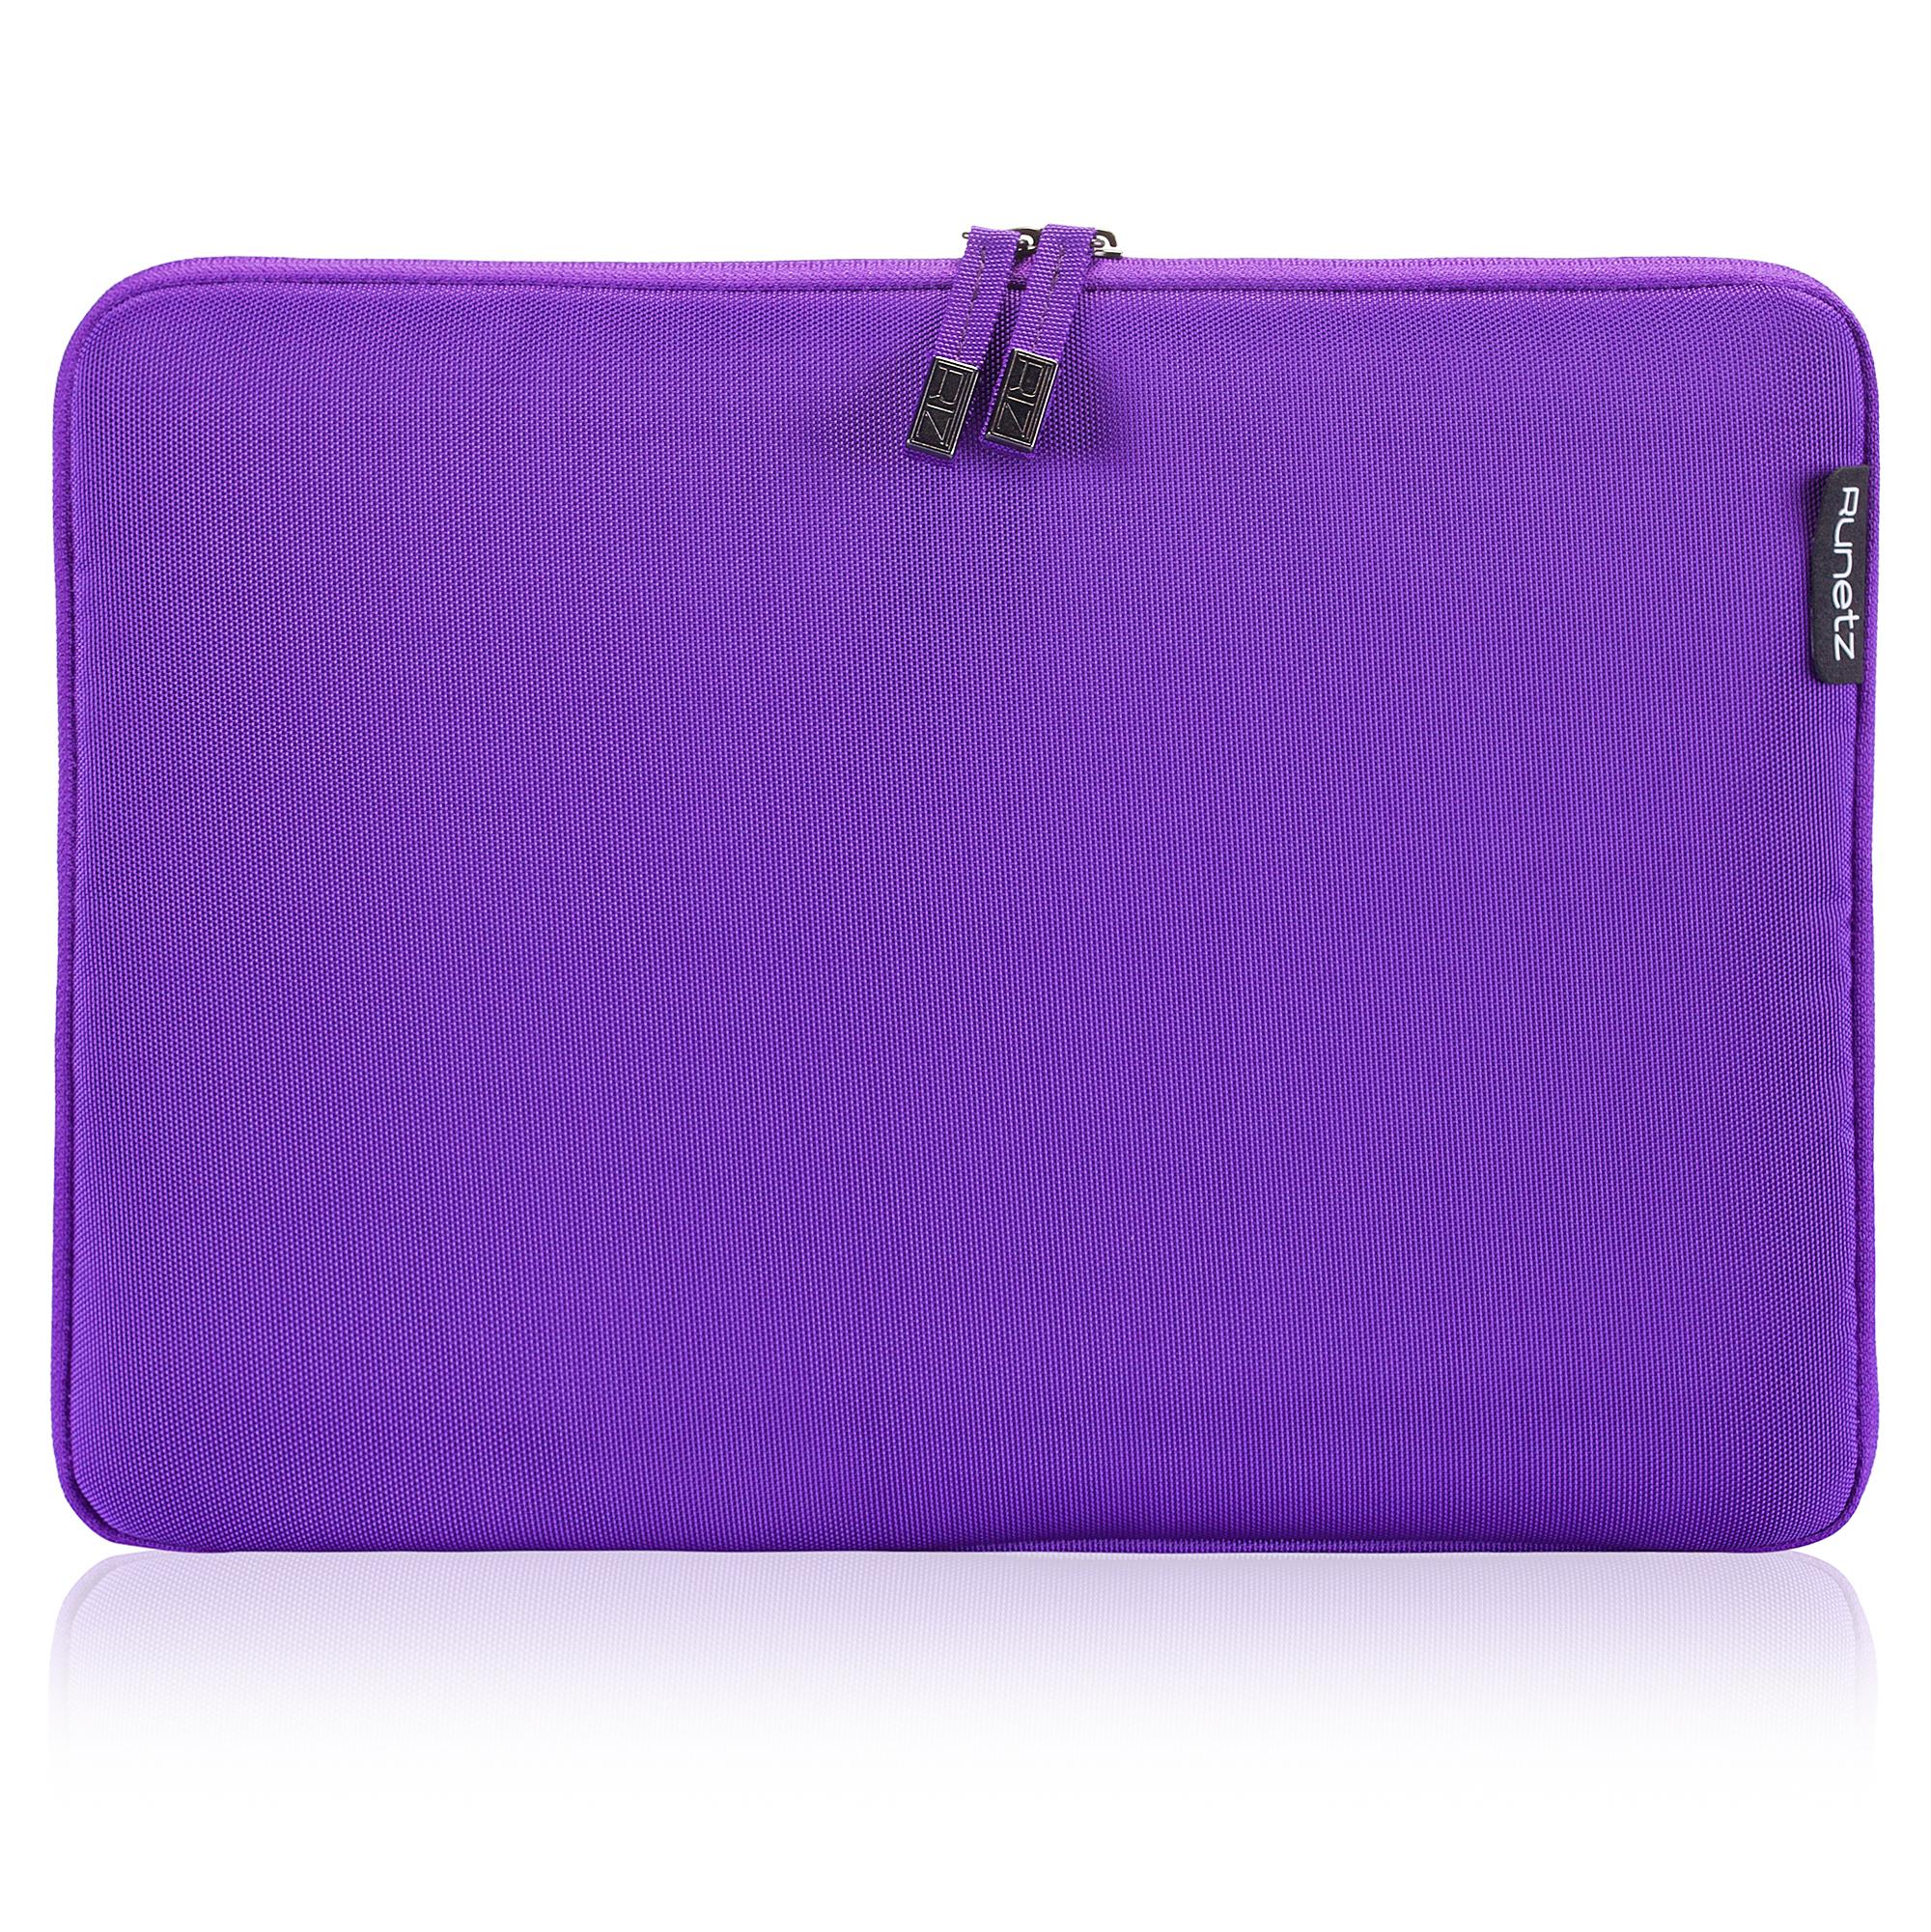 Runetz - Soft Sleeve Cover for MacBook 11